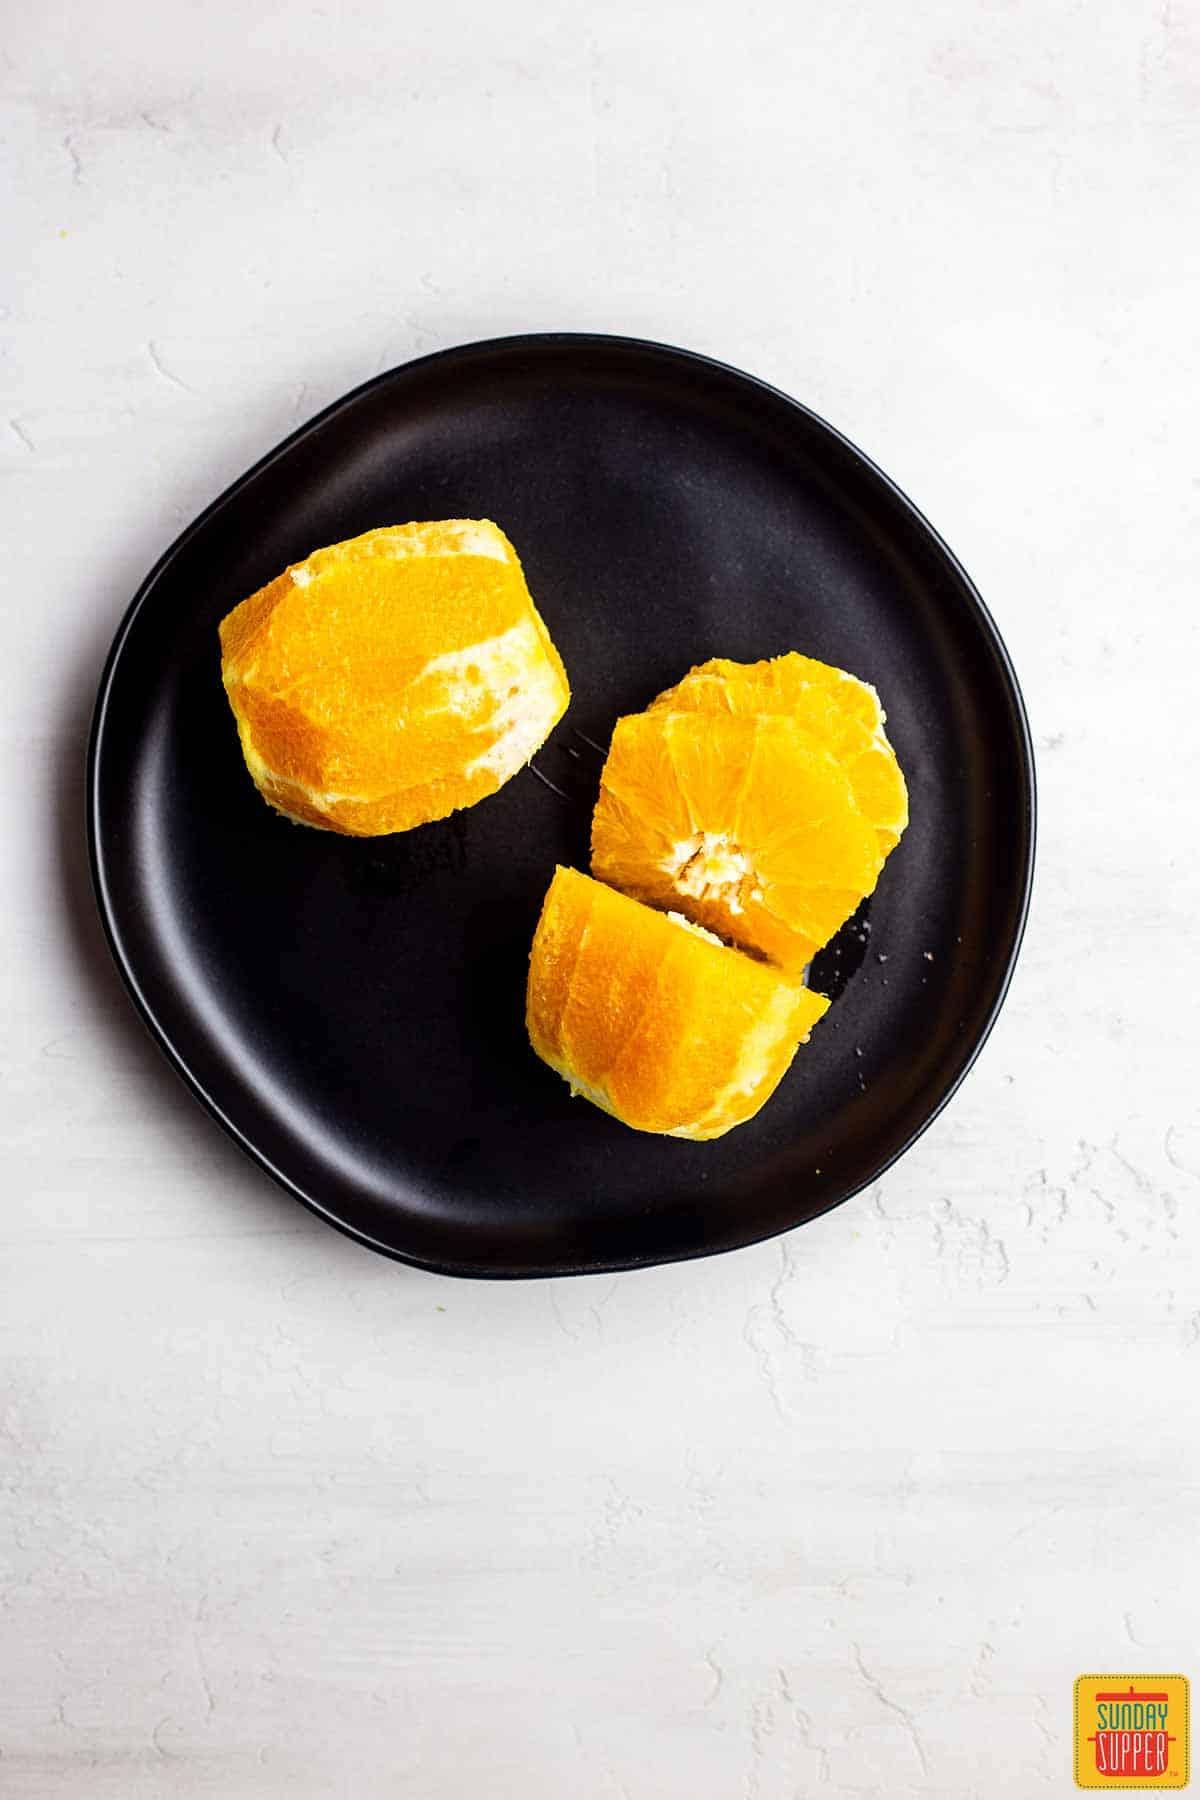 Fresh cut oranges on a black plate